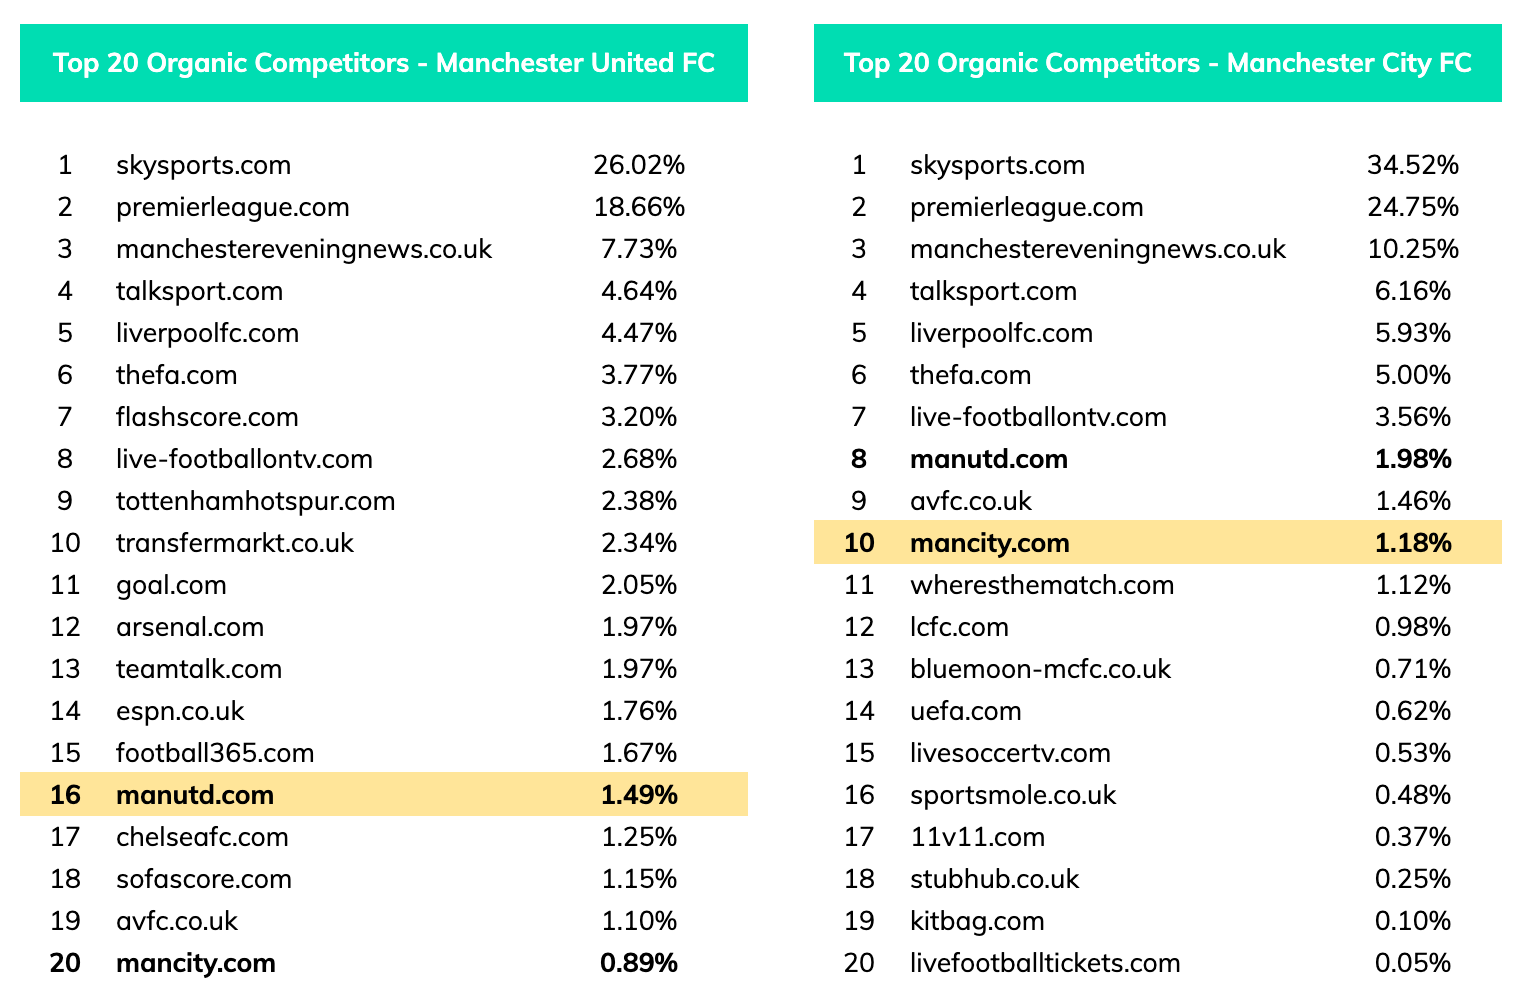 Seo competitor analysis man u vs man city 27